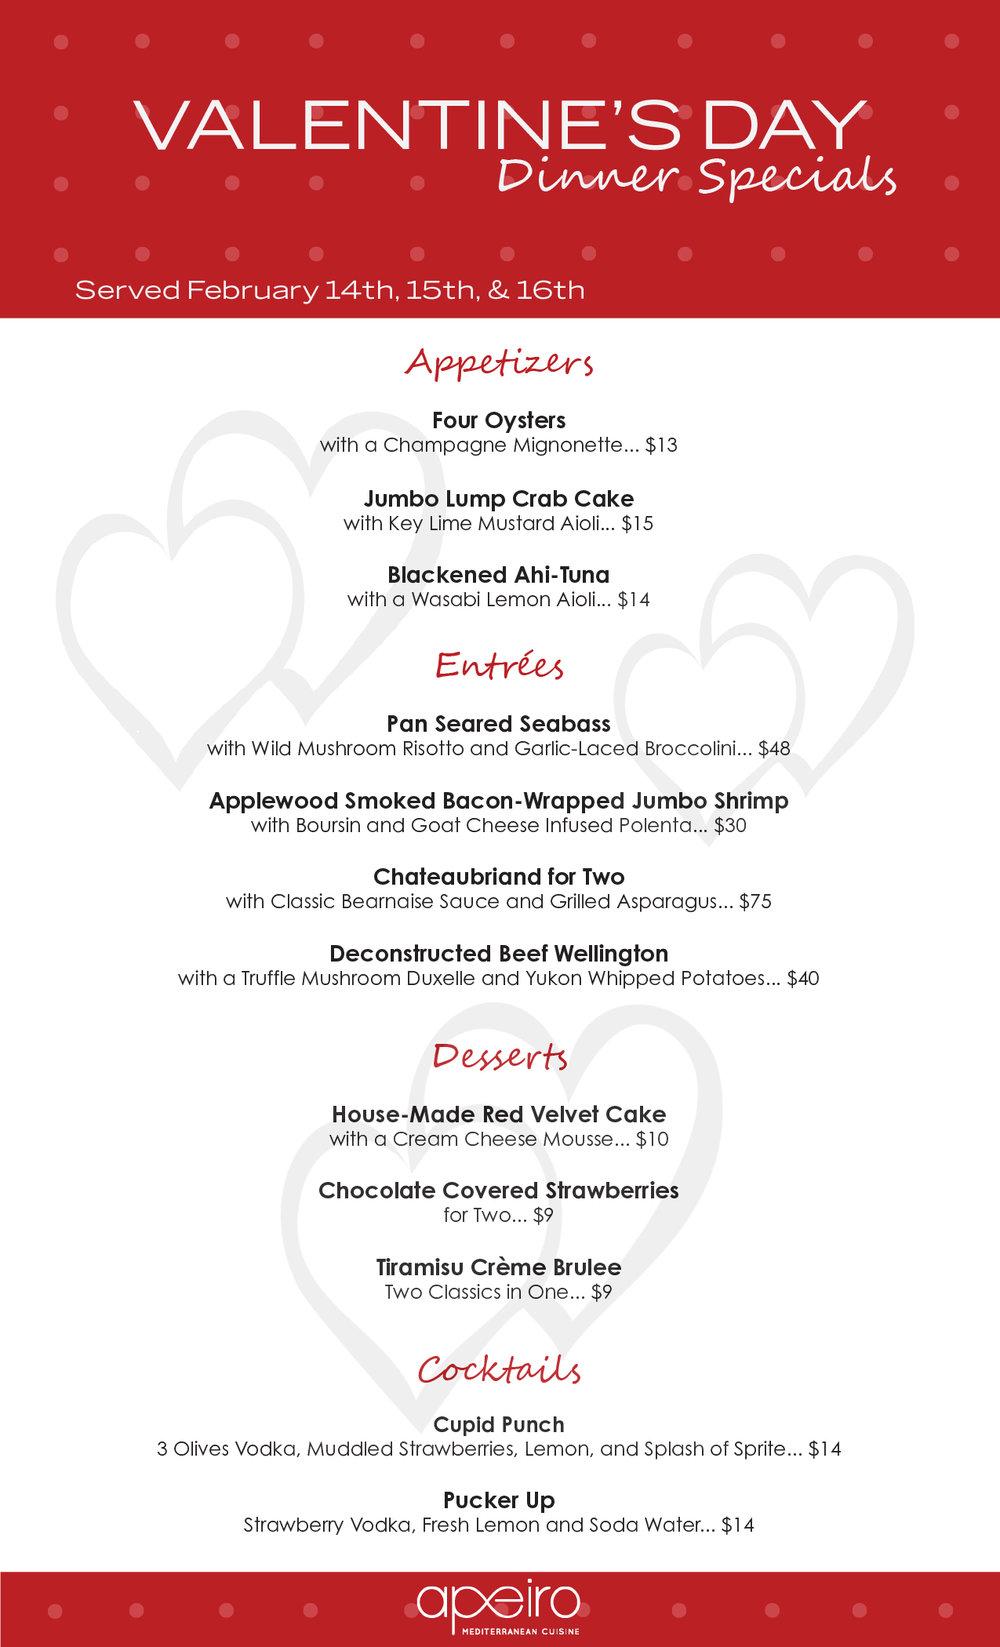 APEIRO MEDITERRANEAN CUISINE  - Valentine's Day Dinner Specials (Served February 14, 15 and 16)